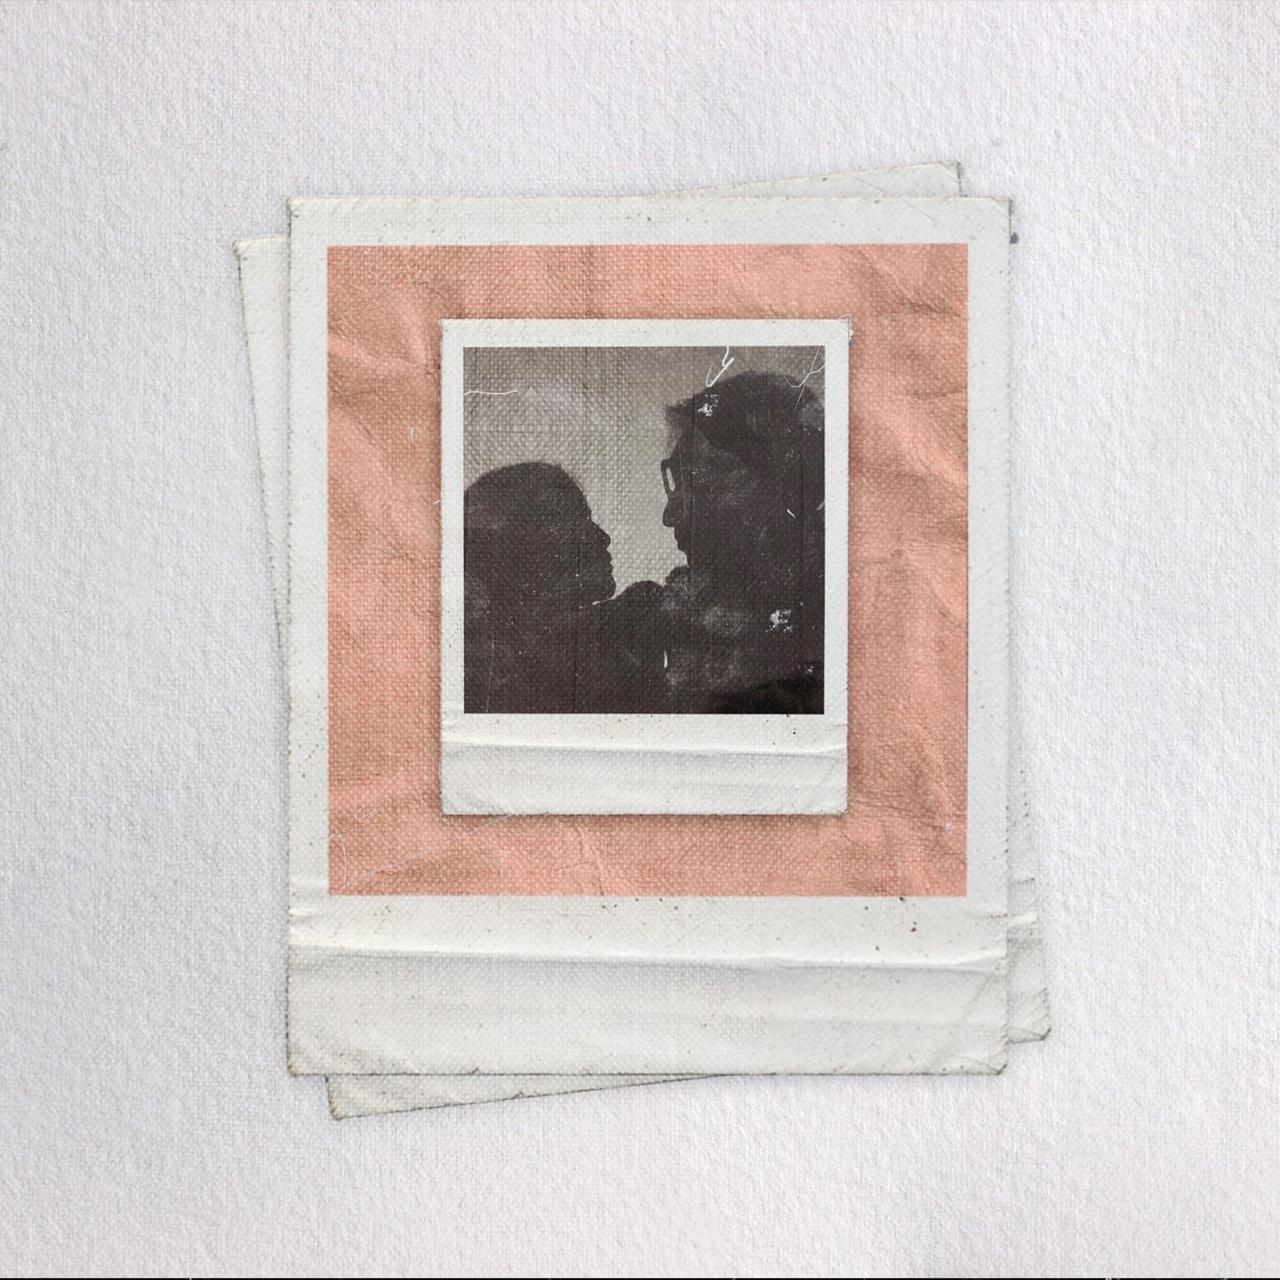 фото из альбома Юрия Пака №1